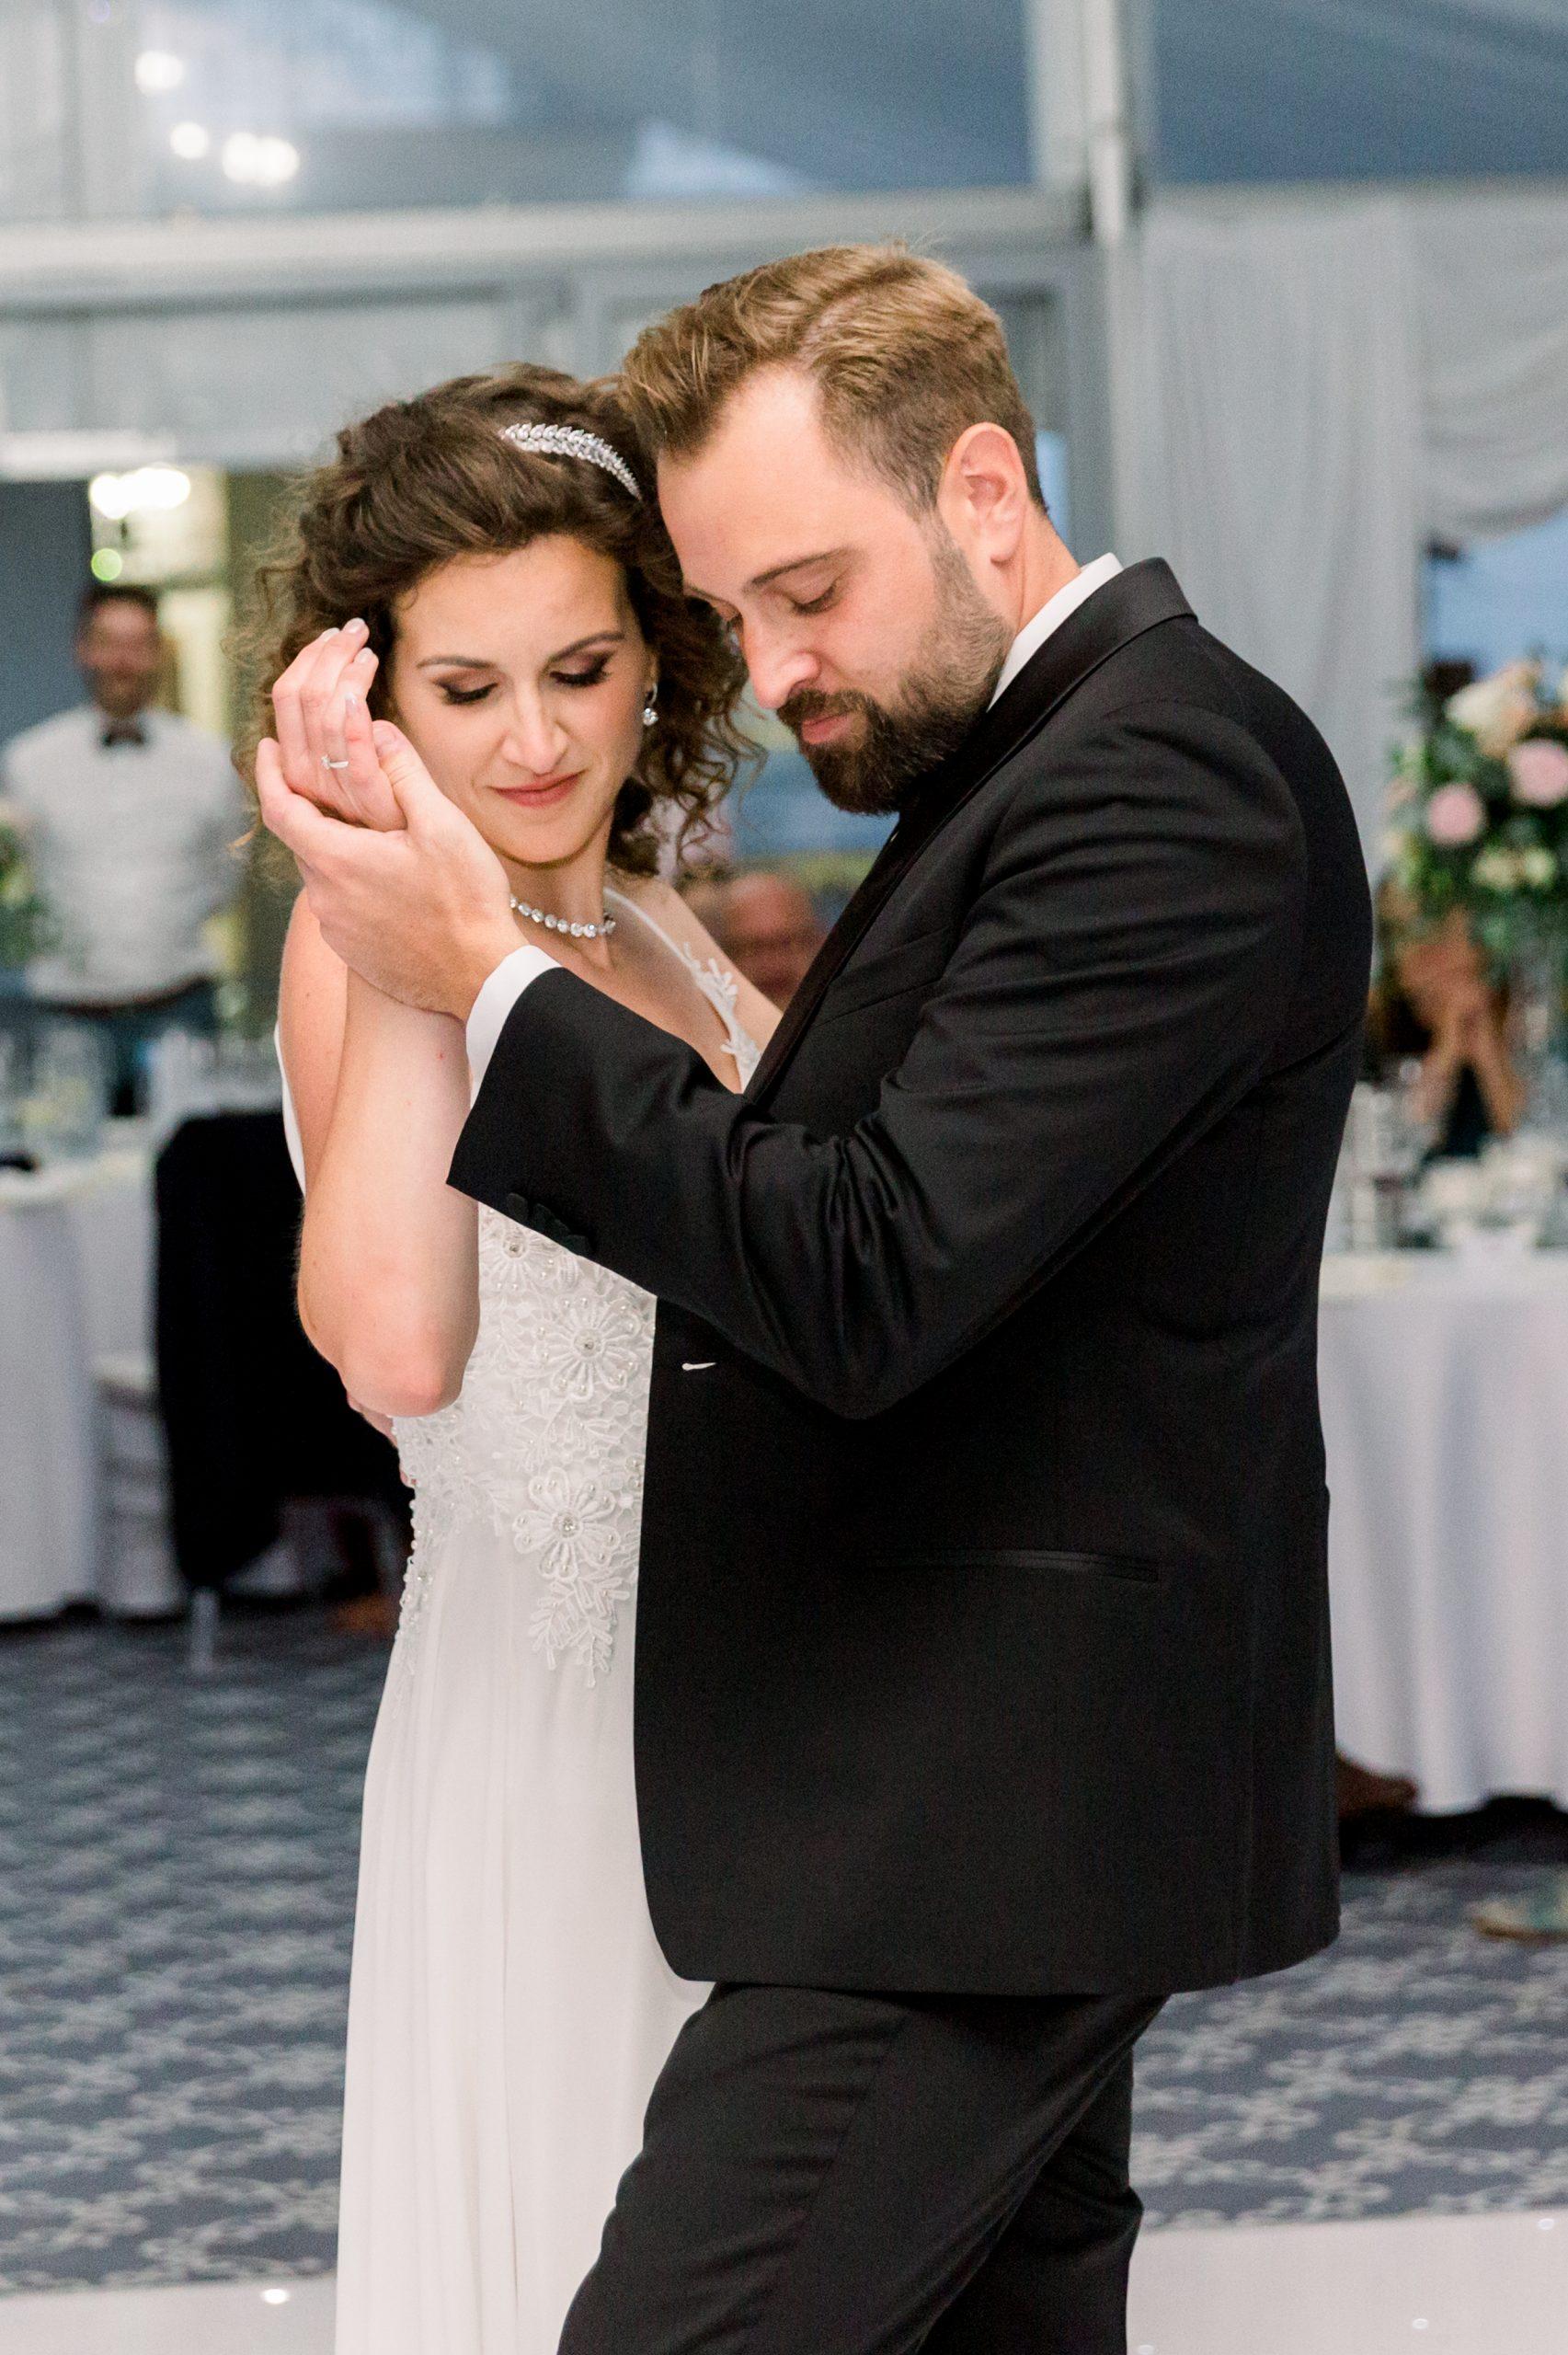 Svadba Art Hotel Kaštiel, Tomášov 01 #svadobnyDJ, #djanasvadbu, #svadba, #svadbatomasov, #DJAnavi